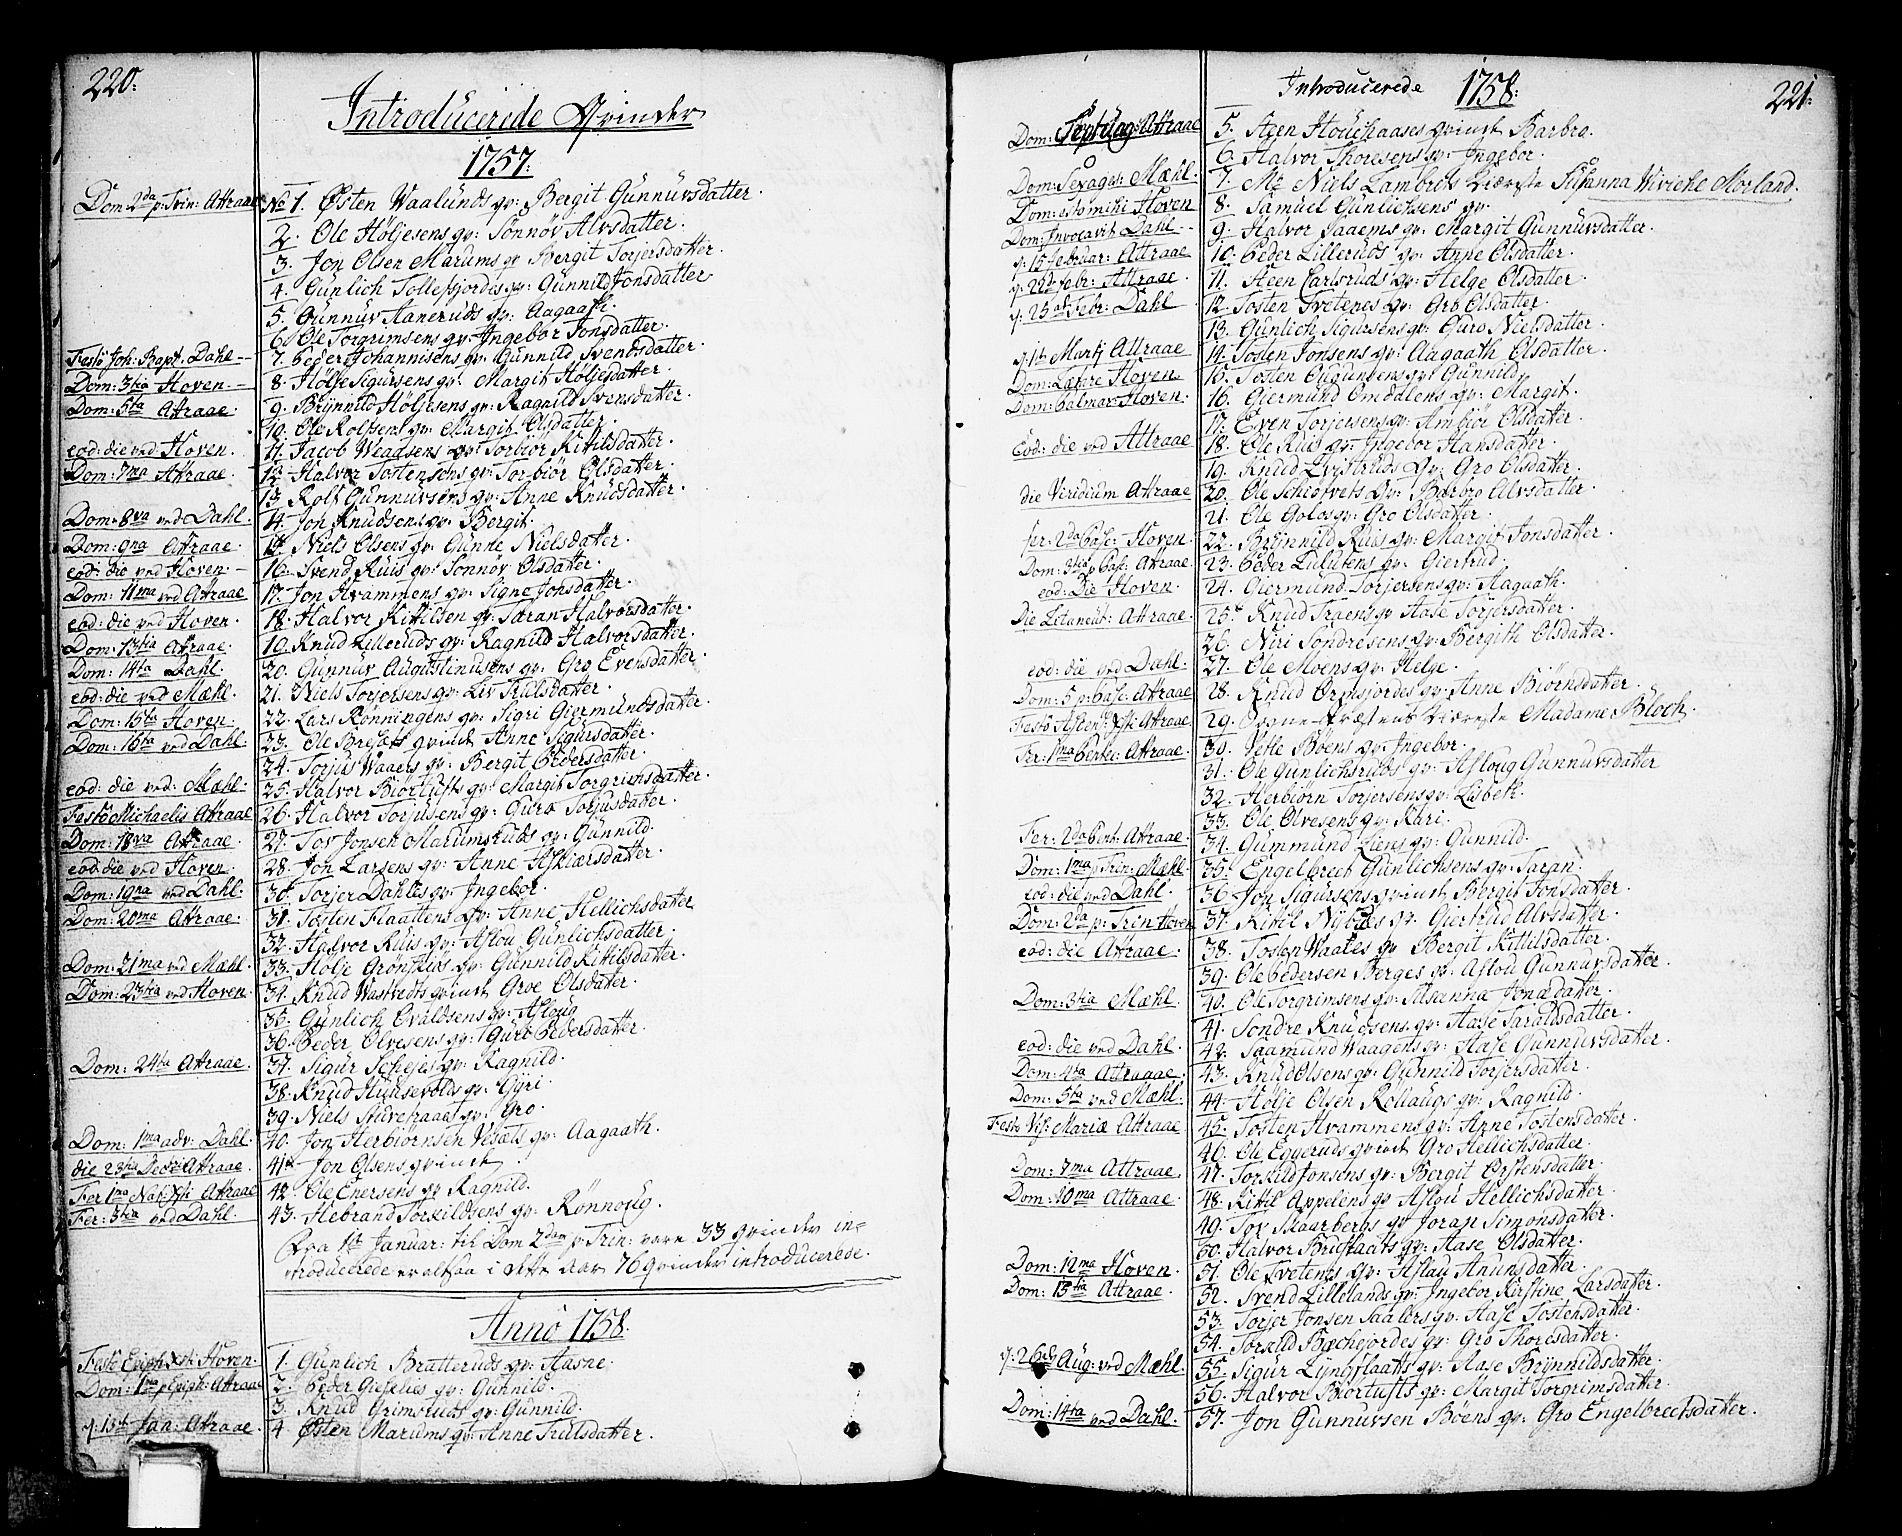 SAKO, Tinn kirkebøker, F/Fa/L0002: Ministerialbok nr. I 2, 1757-1810, s. 220-221